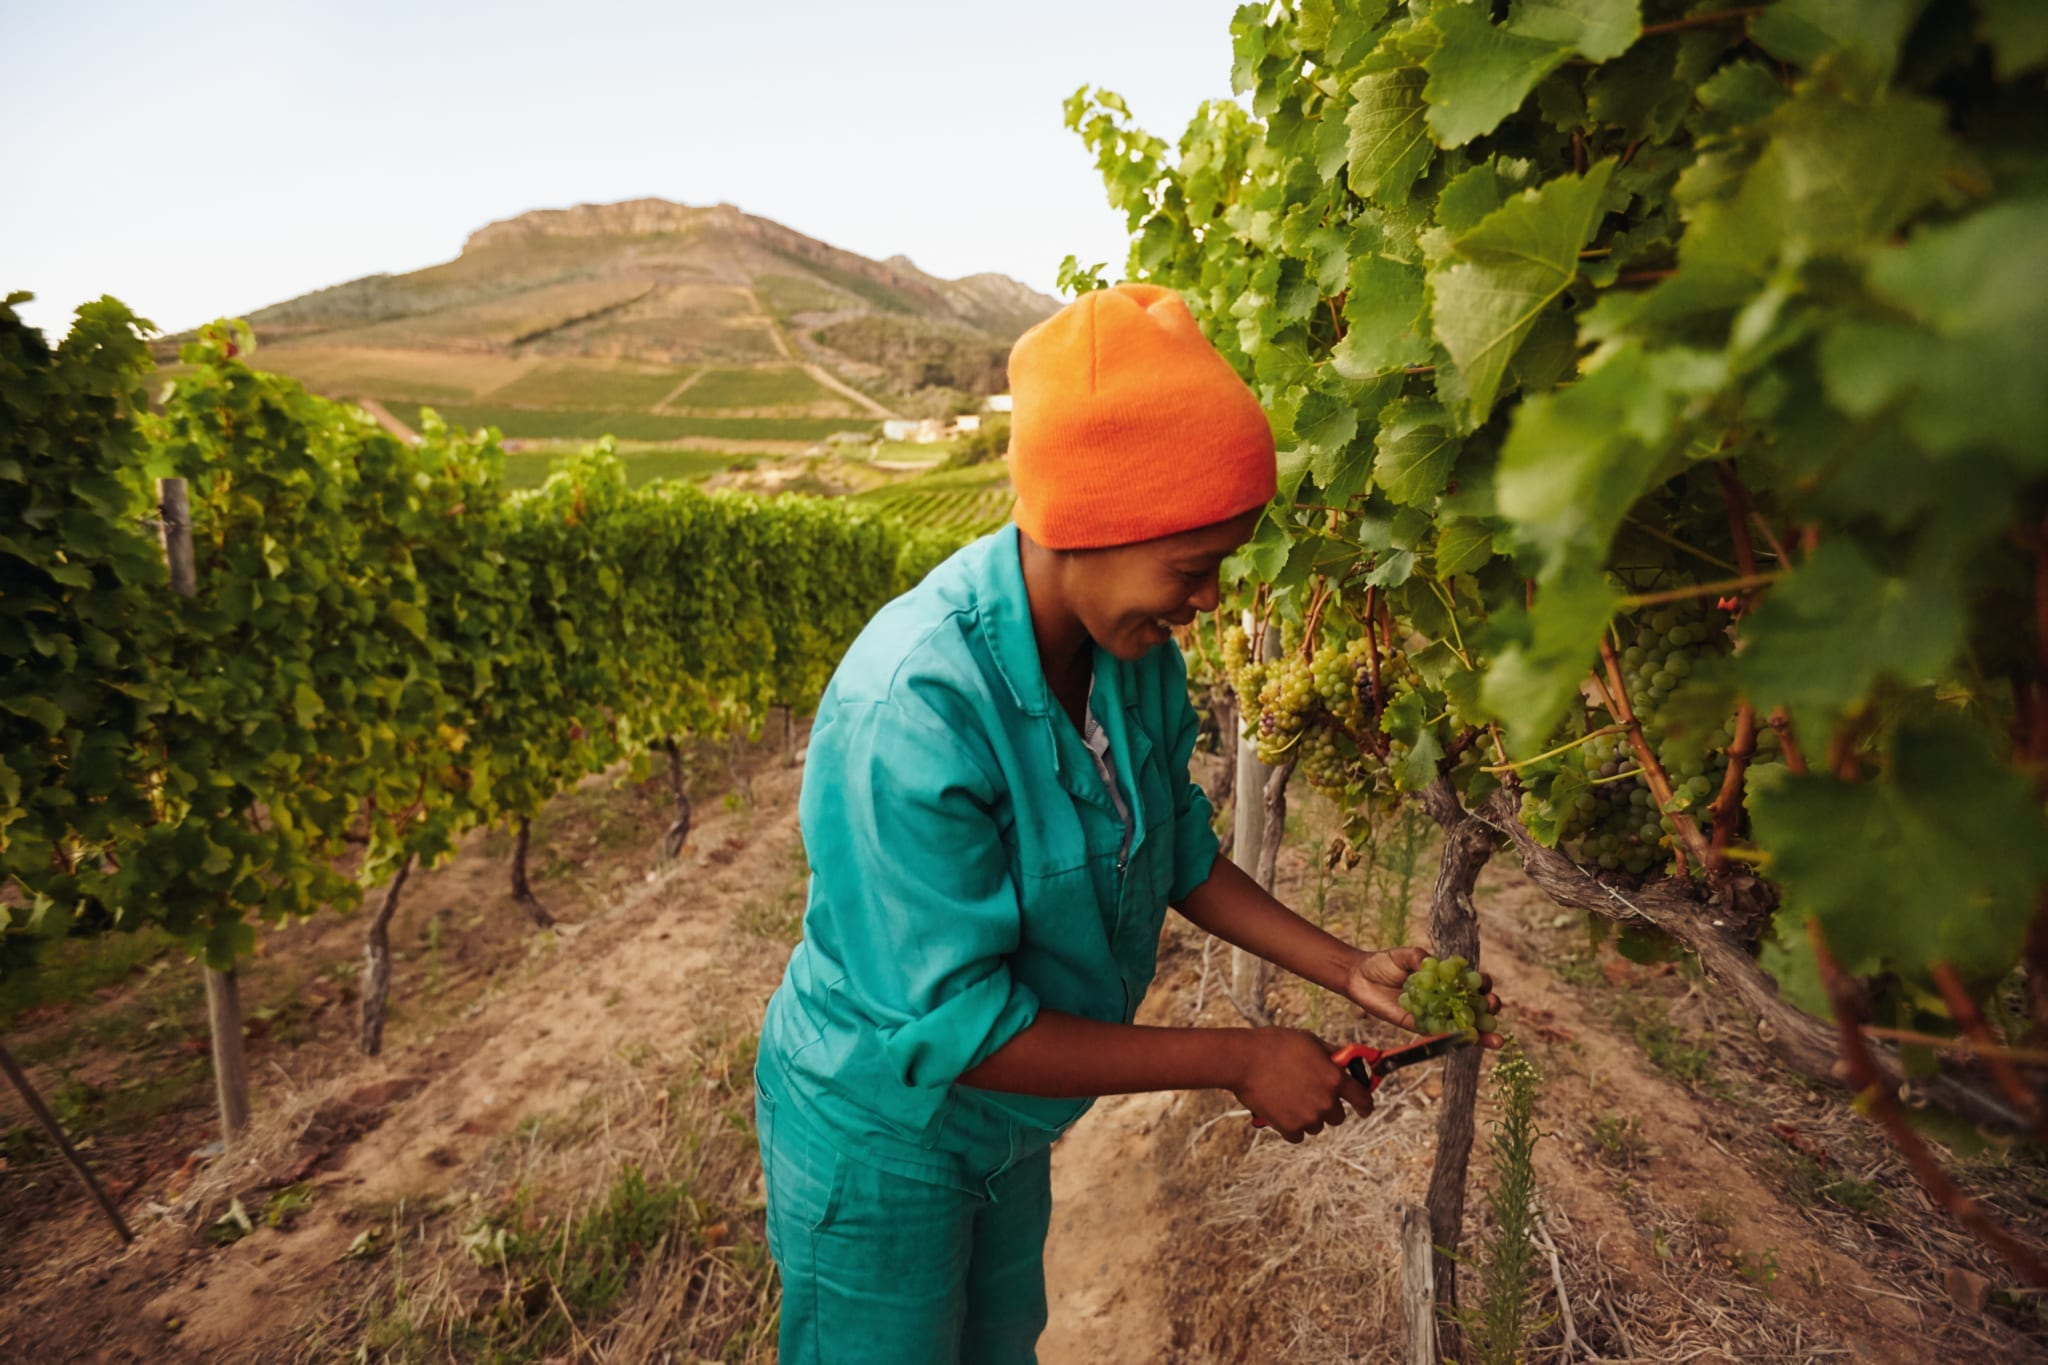 Woman in vineyard picking grape. Picker harvesting grapes on the vine.